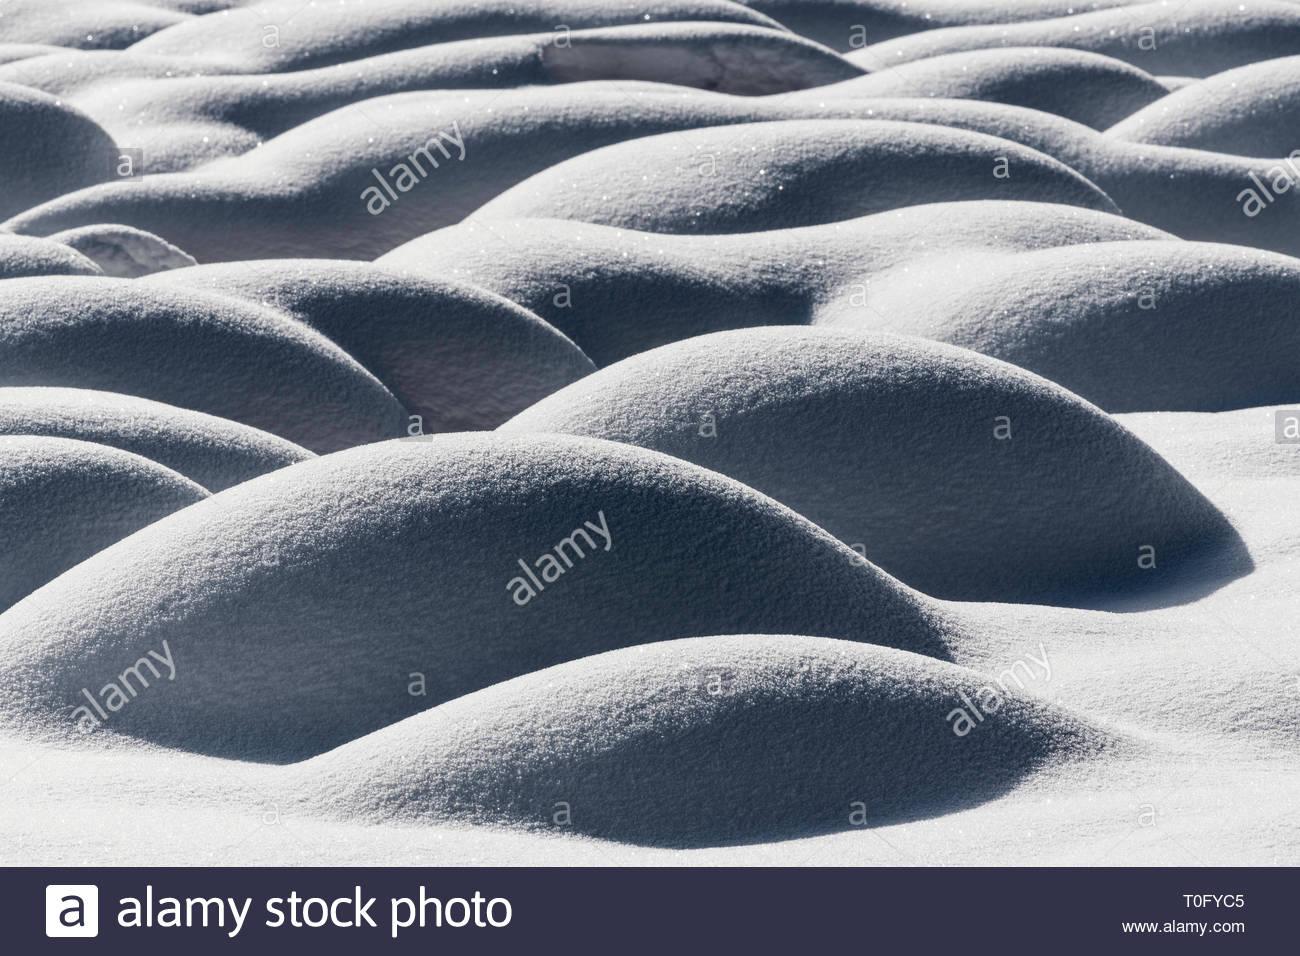 Mounds of snow formed over tussocks of sedges, Zelenci Spring, Kranjska Gora, Slovenia - Stock Image